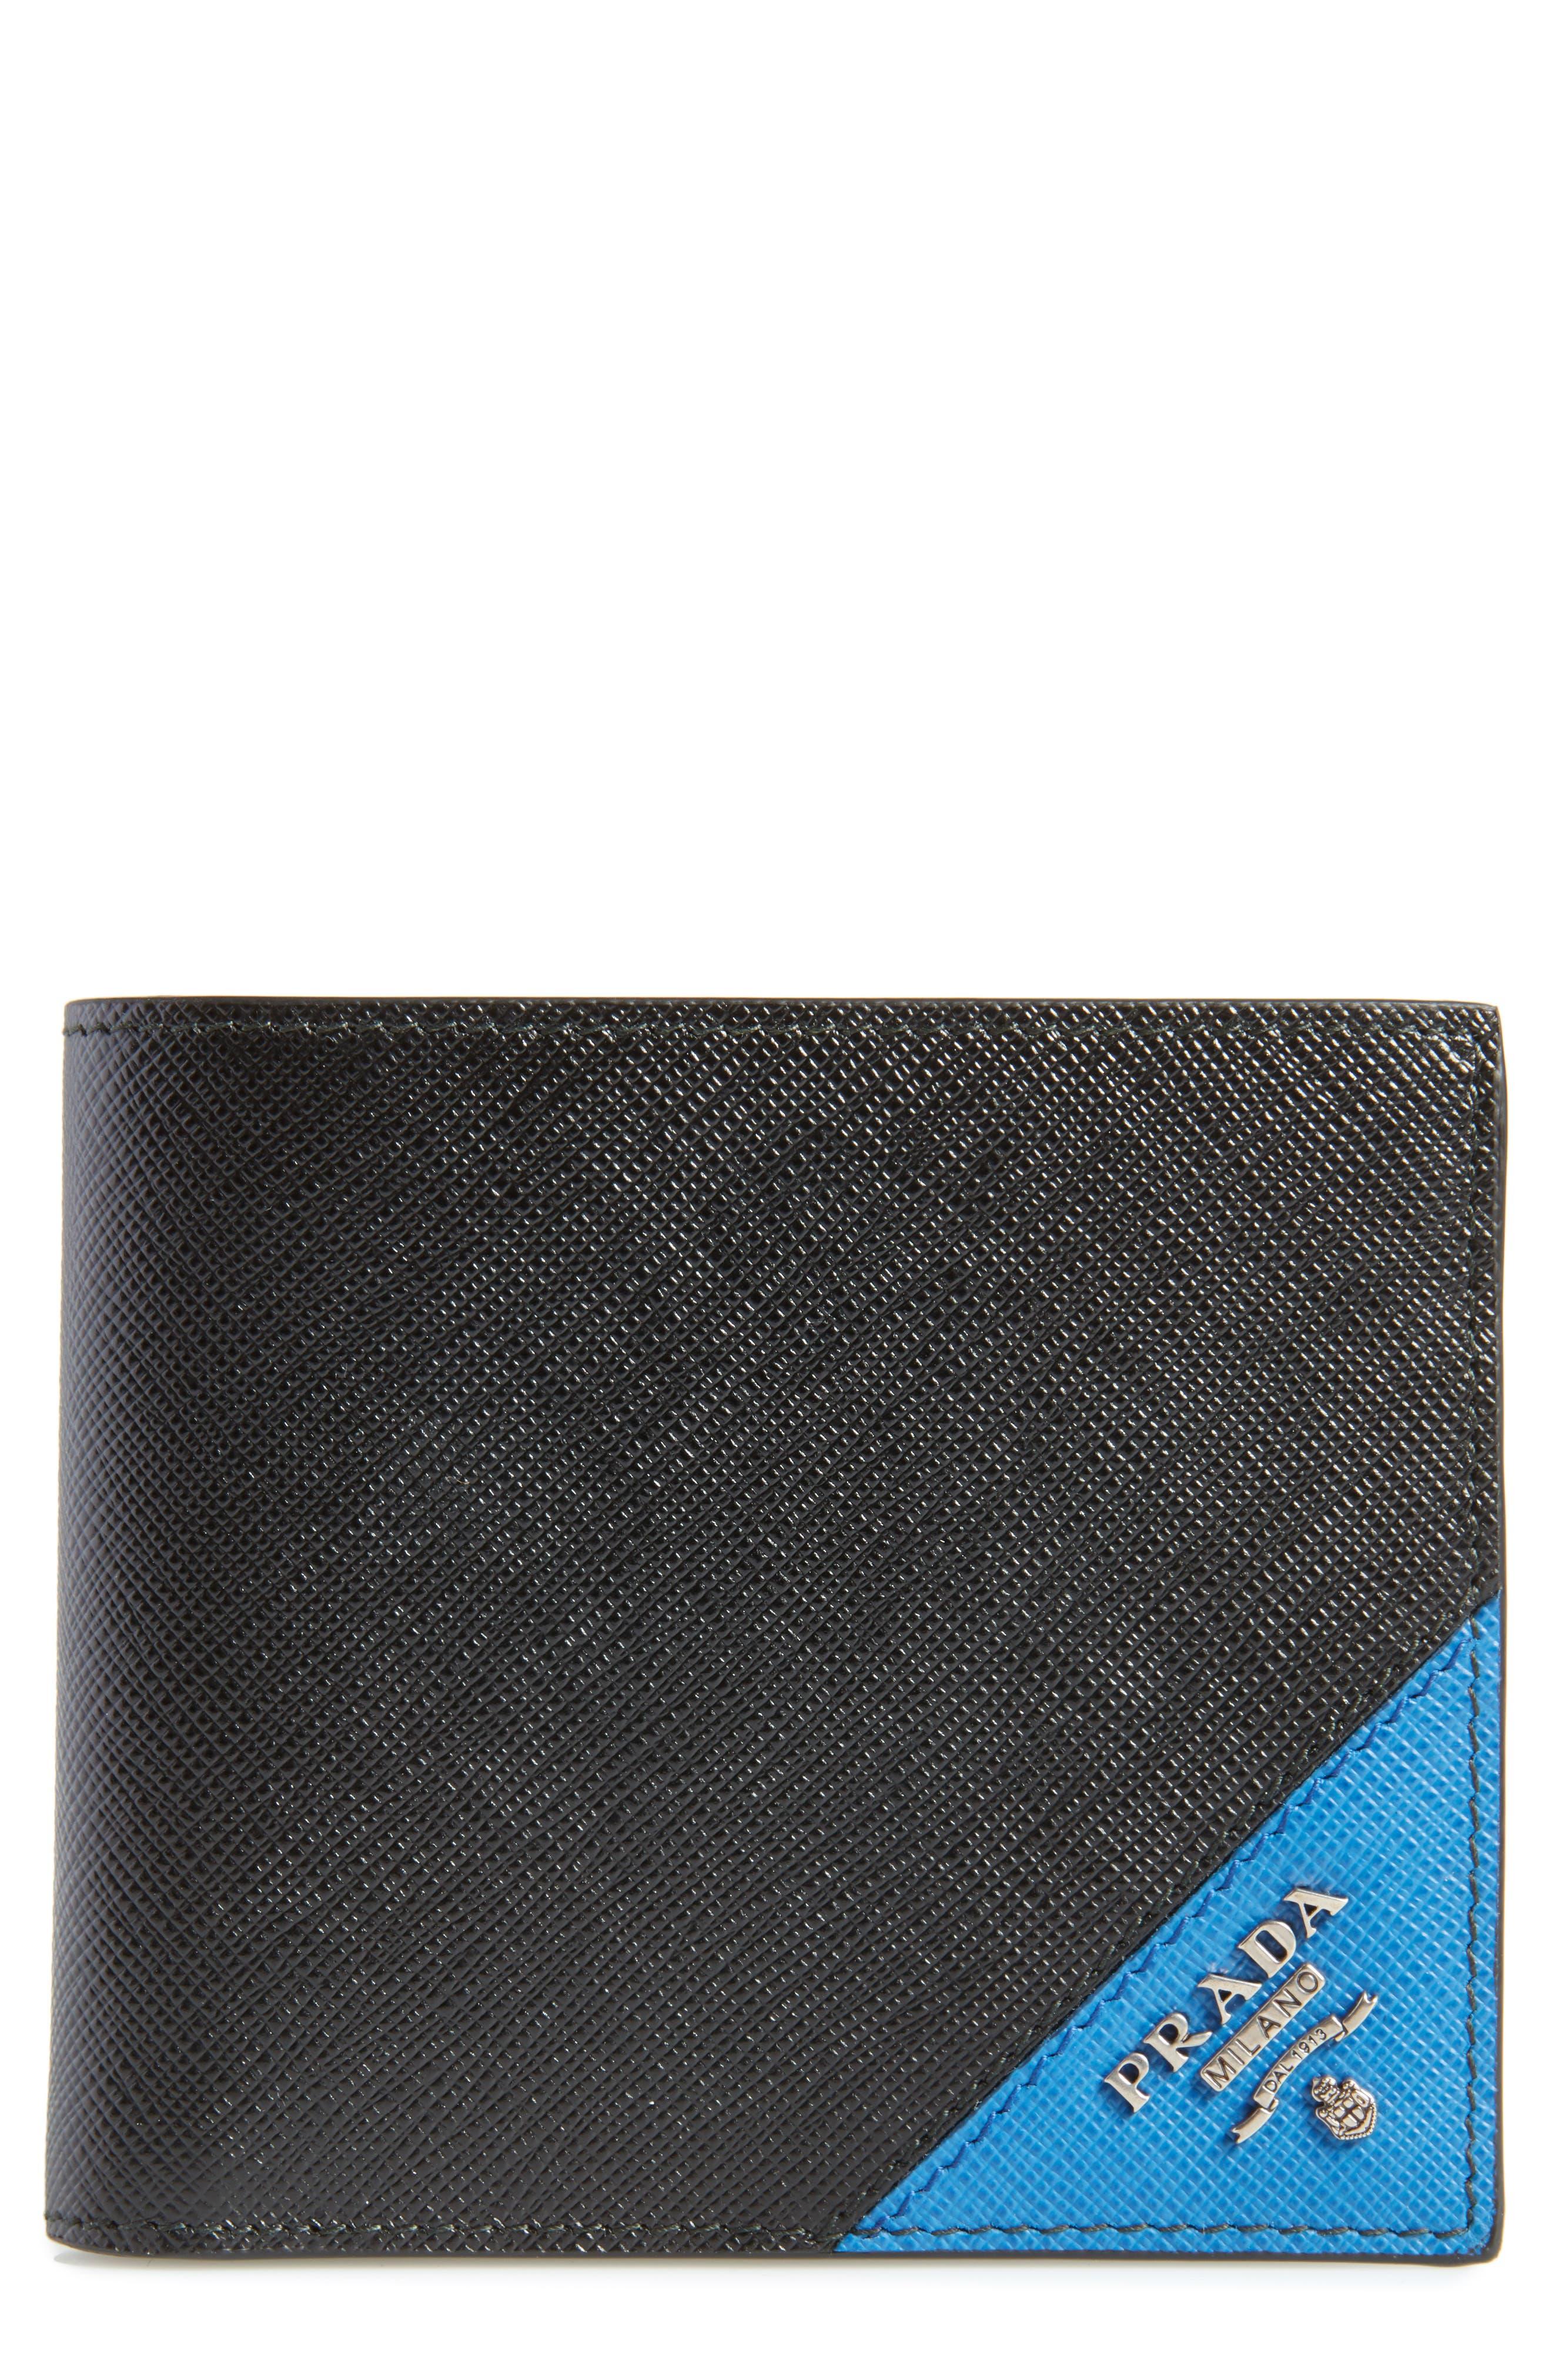 PRADA Saffiano Leather Billfold Wallet, Main, color, NERO AND CERISE